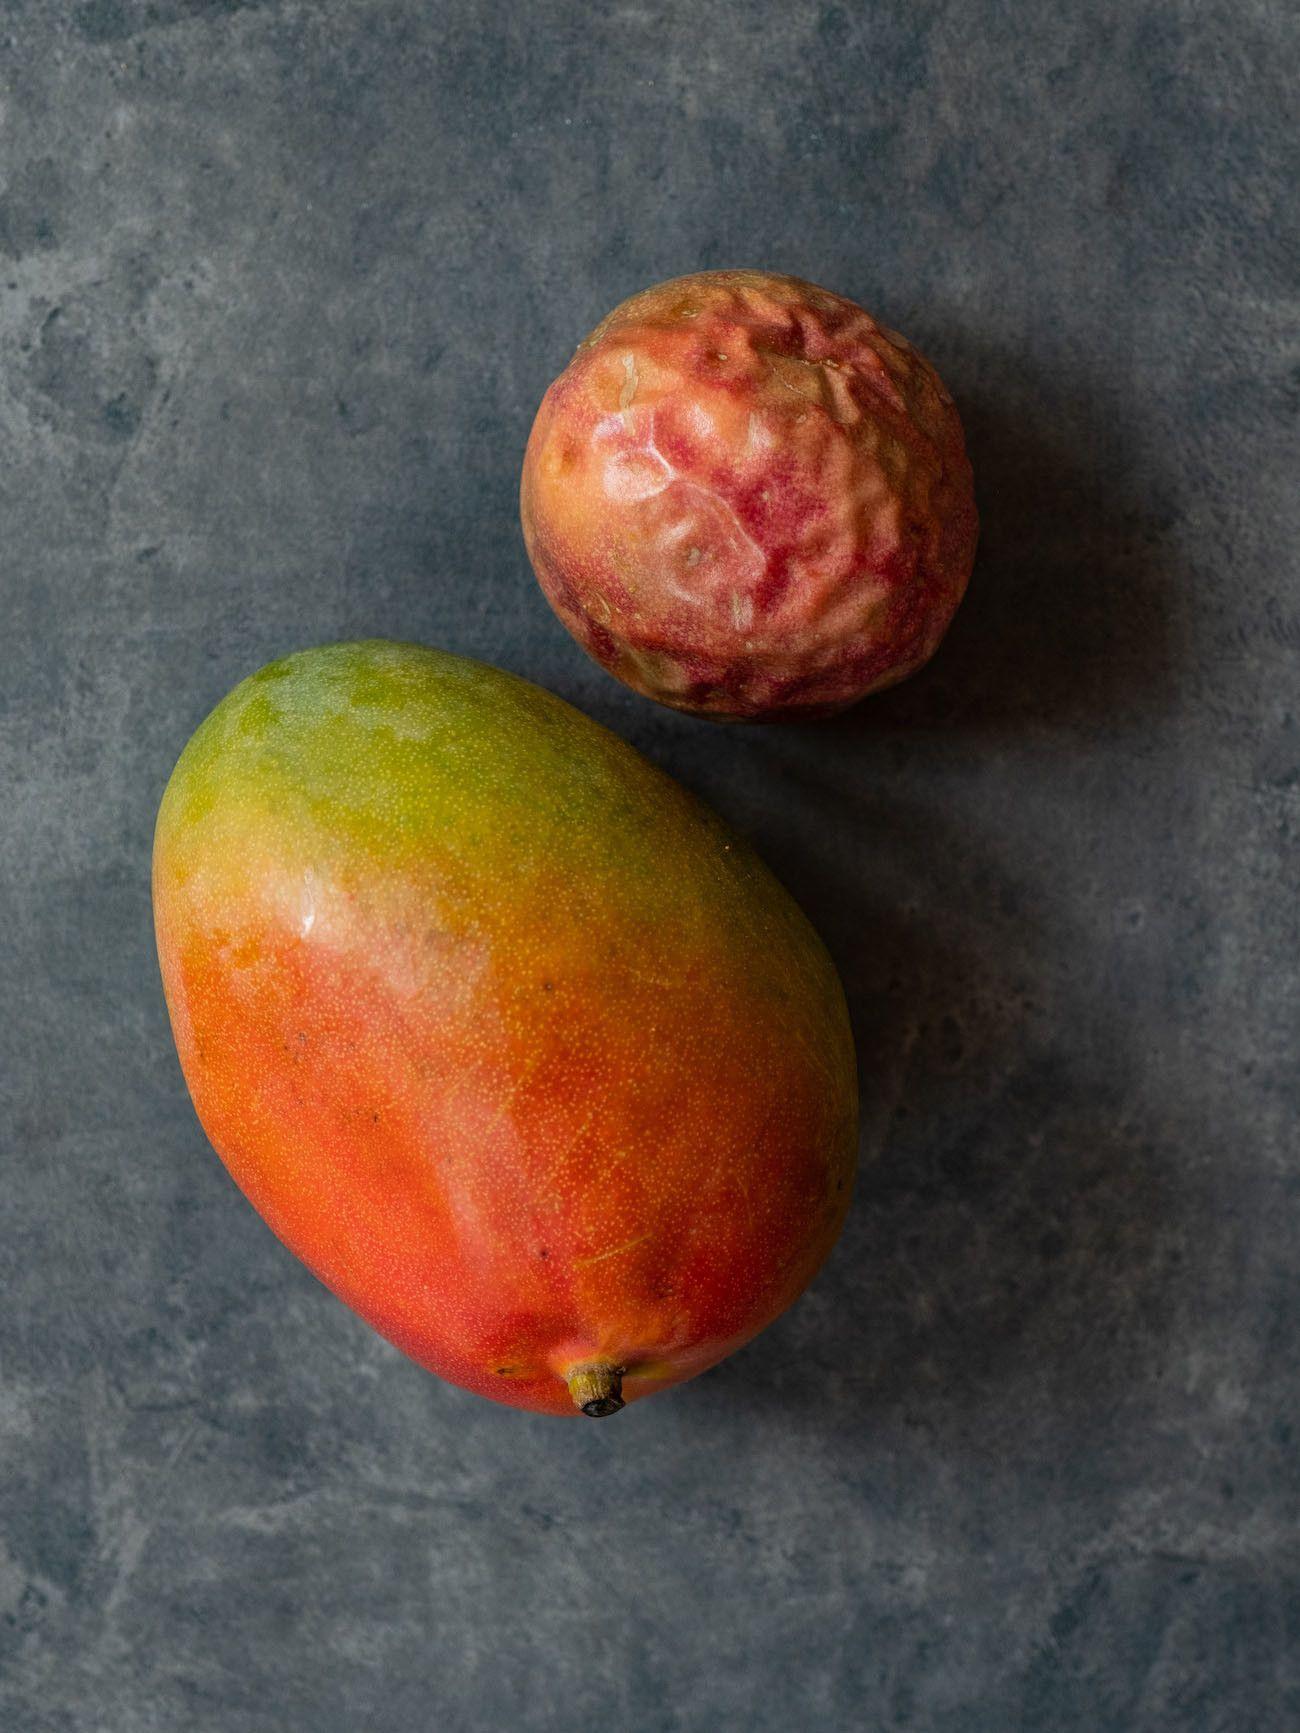 Foodblog, About Fuel, CEVICHE Das Kochbuch, Juan Danilo, Mango, Maracuja